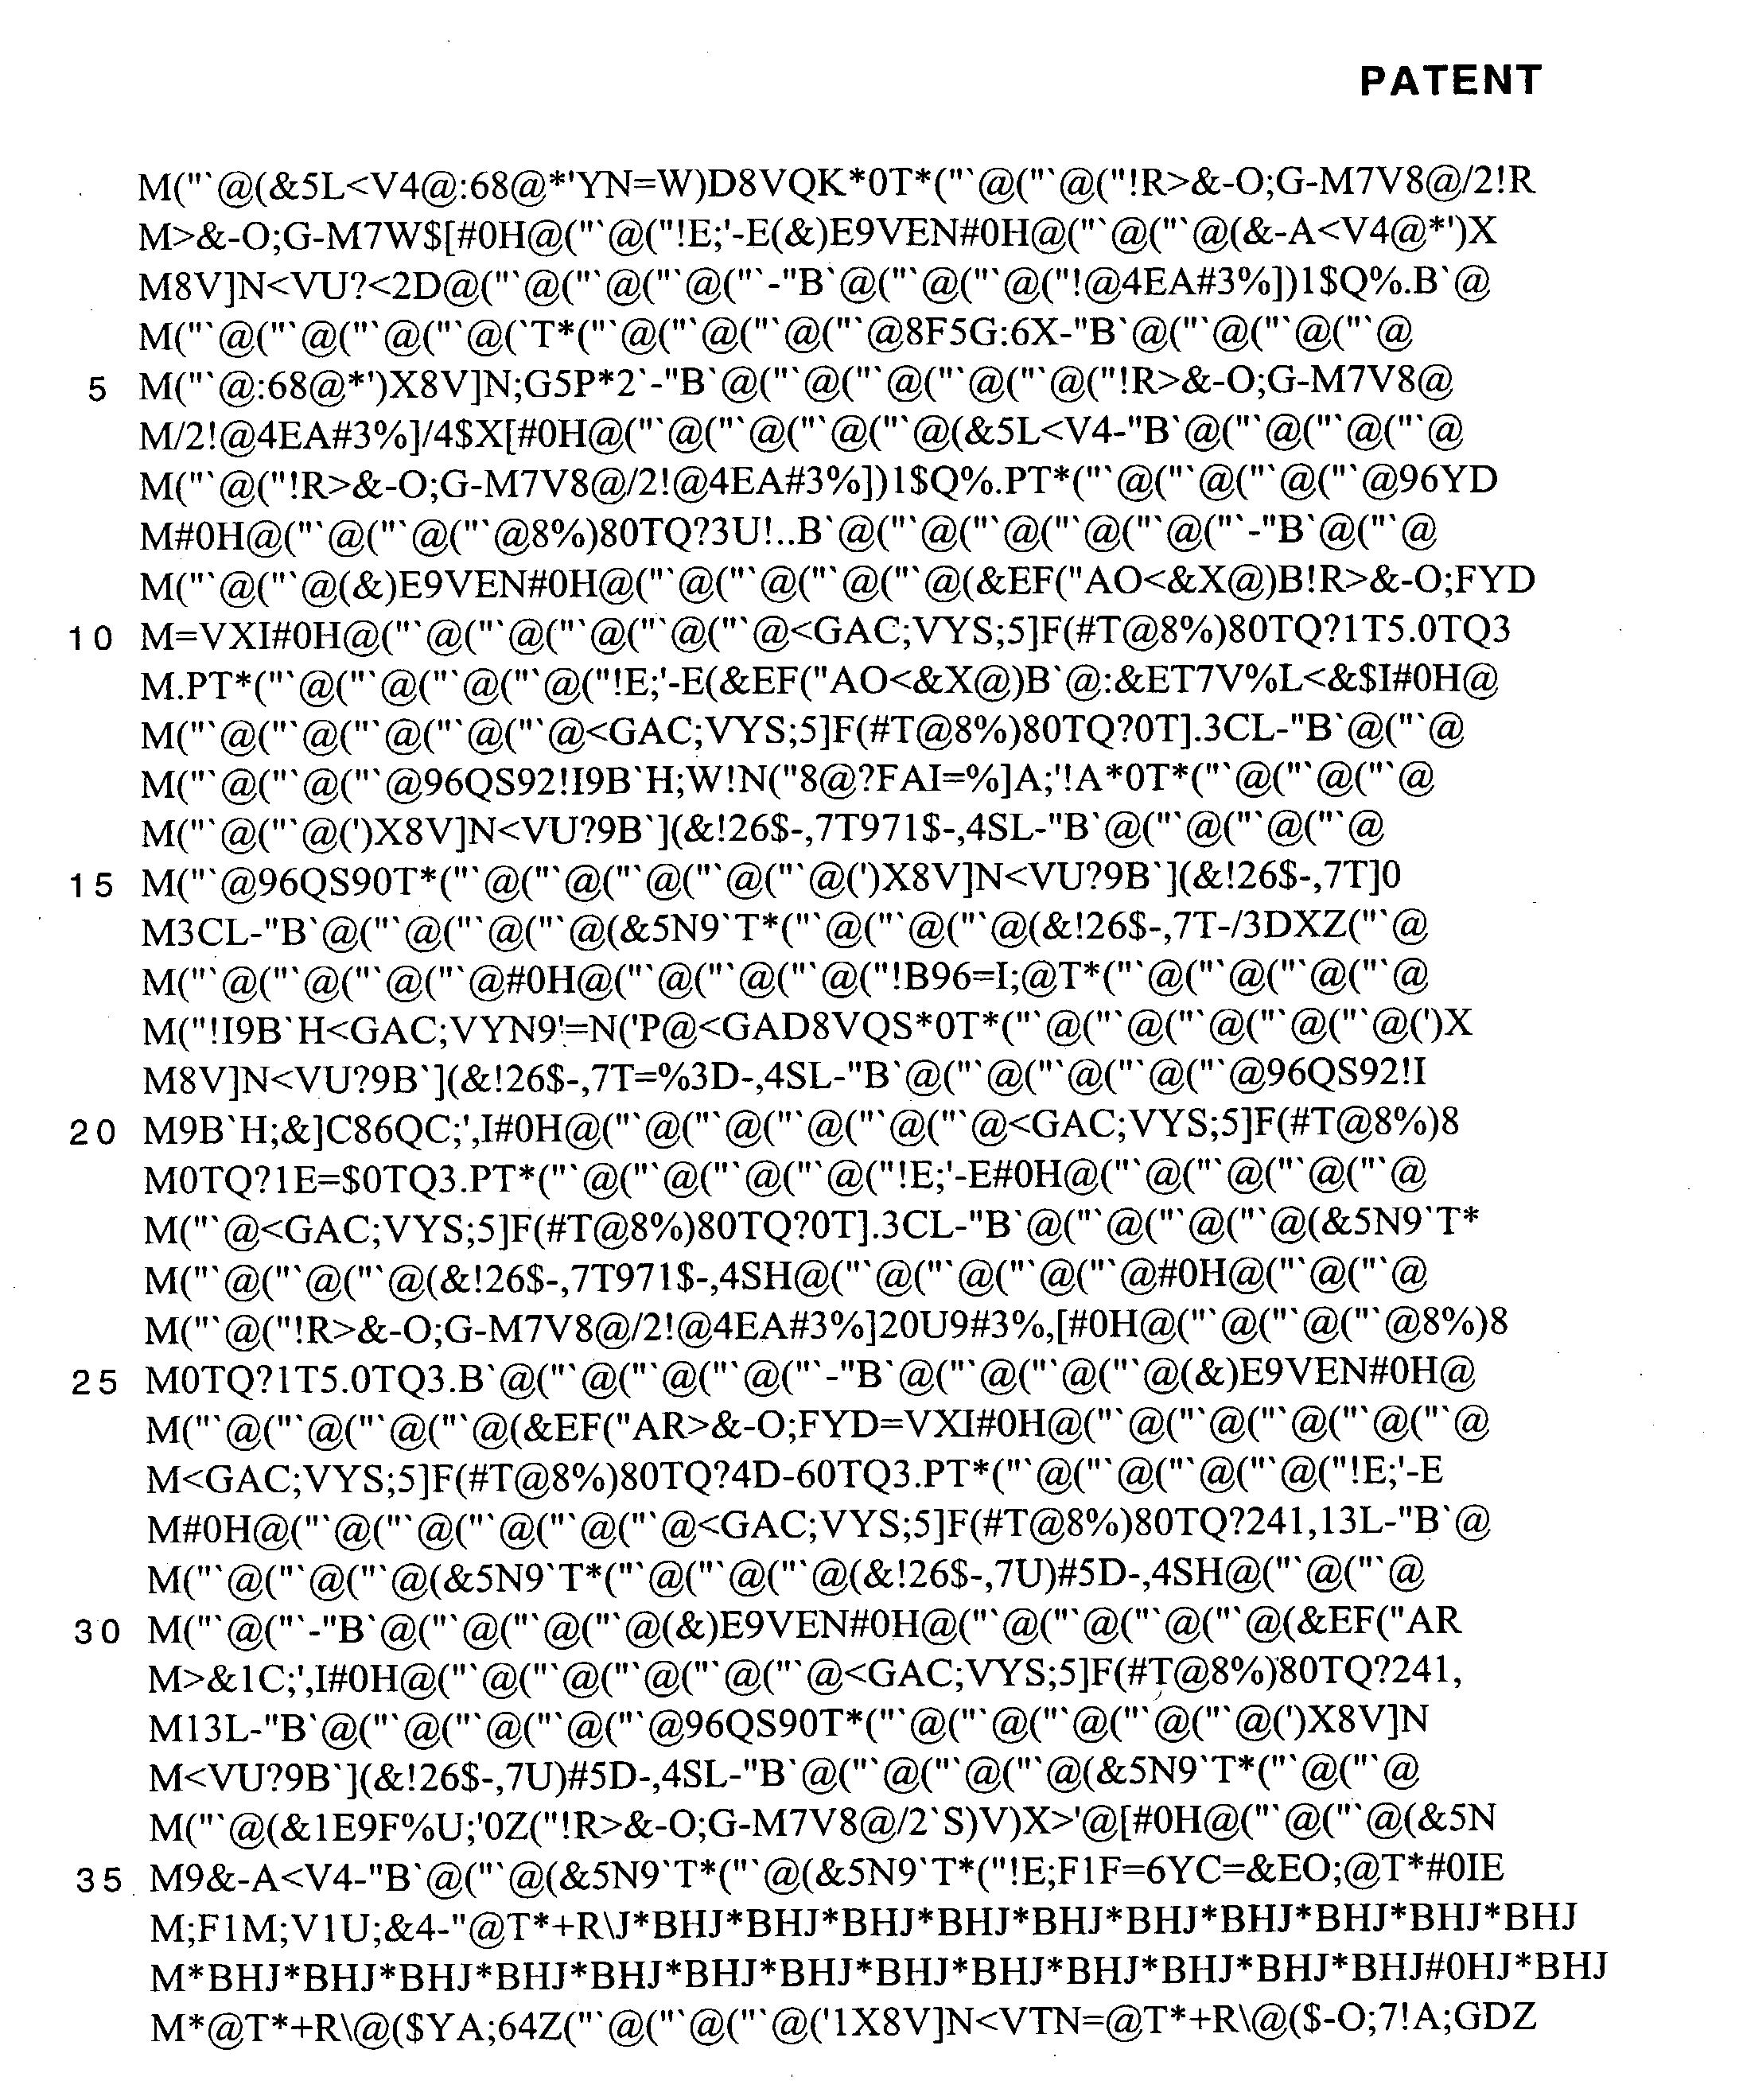 Figure US20030174721A1-20030918-P00012